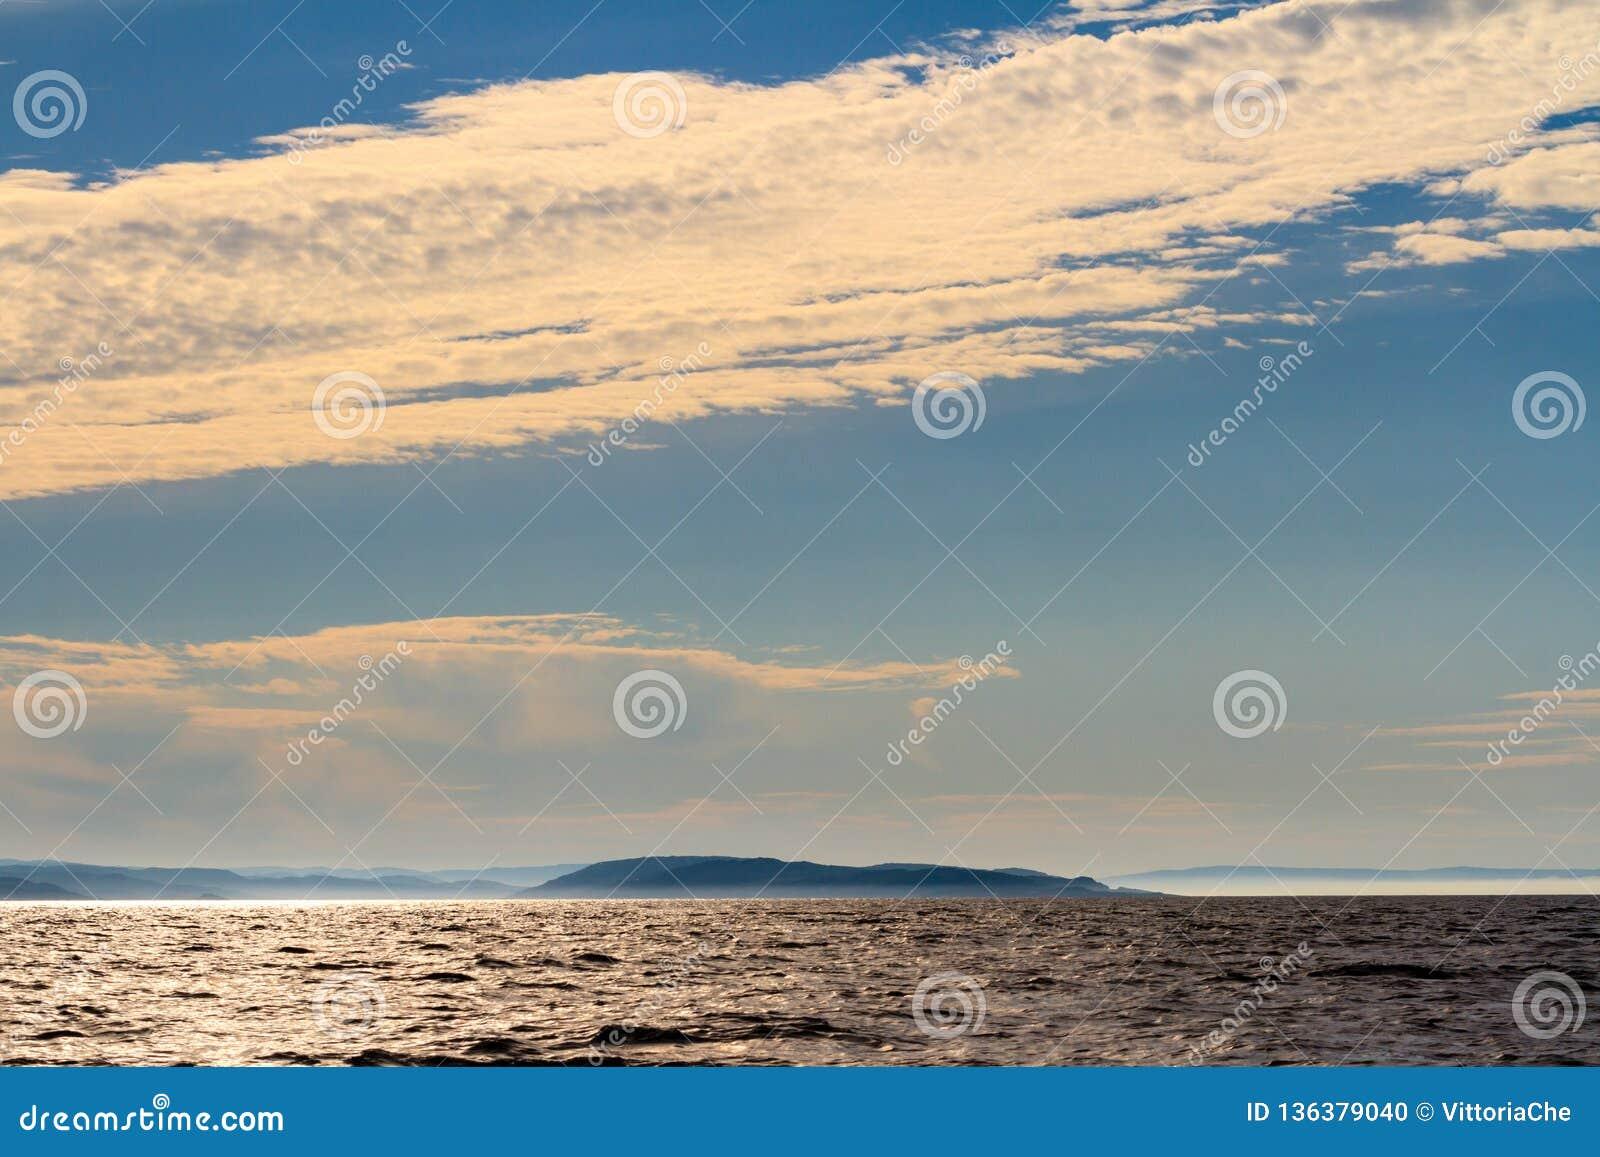 Small island in Barents sea on the sunset. Arctic ocean, Kola Peninsula, Russia